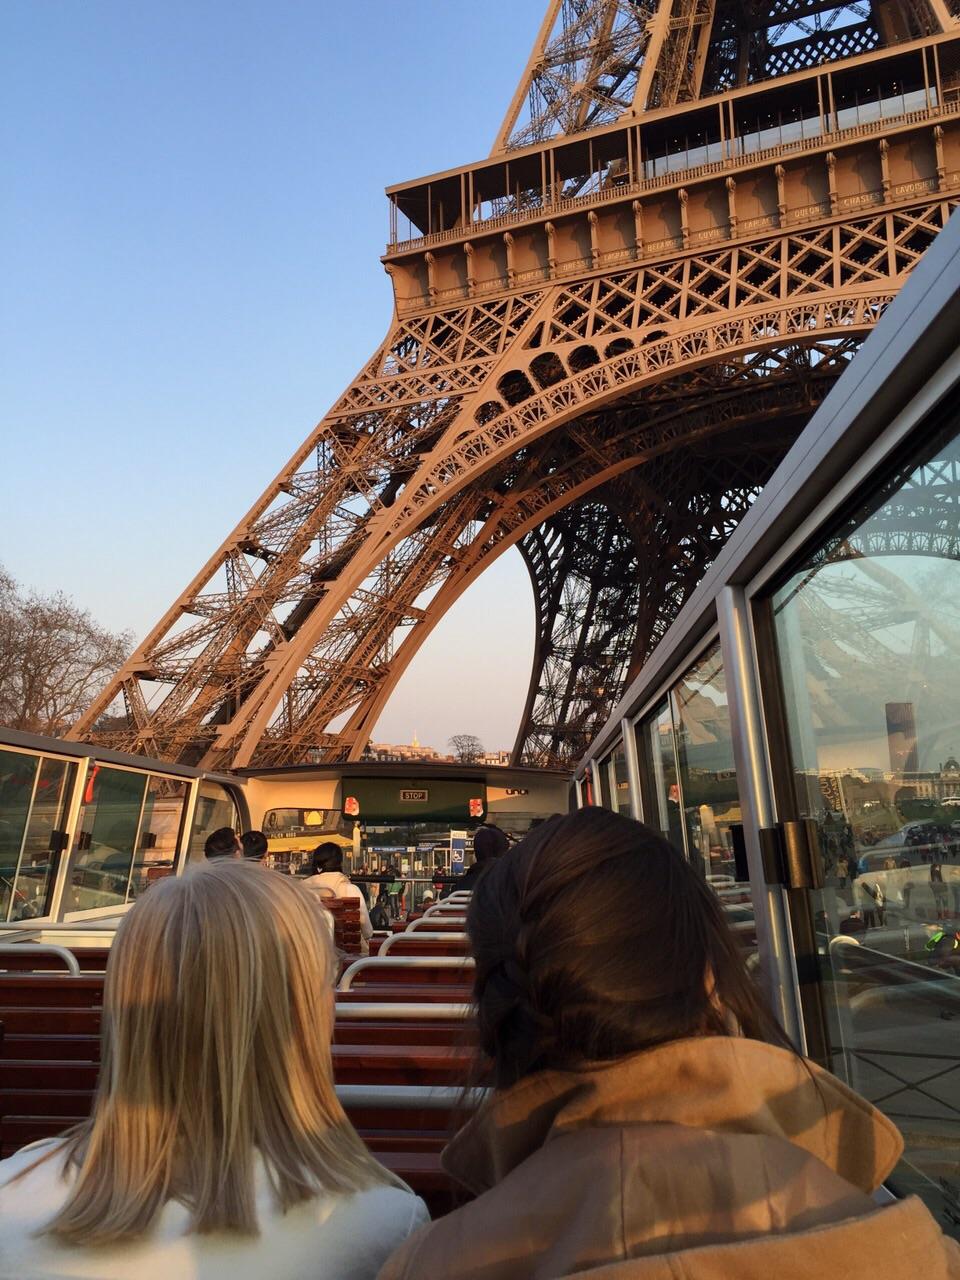 Bus top Eiffel Tower JPG